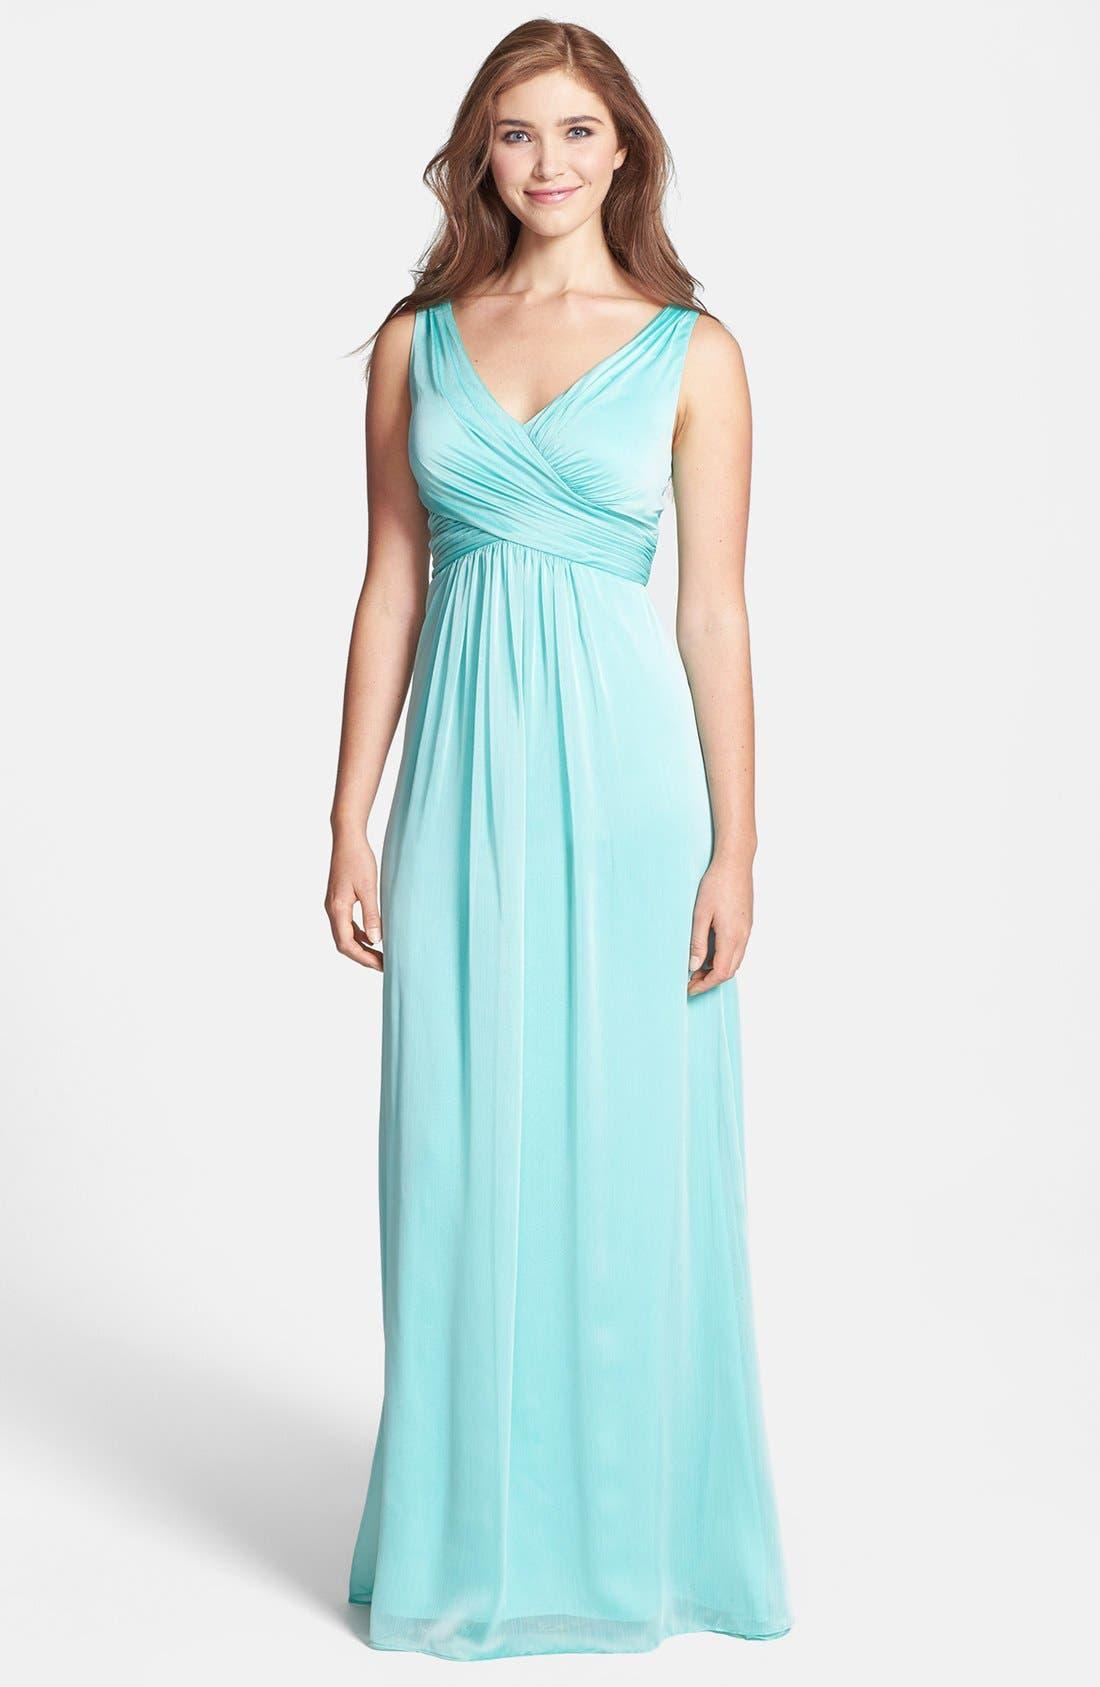 Main Image - Adrianna Papell Crisscross Chiffon Dress